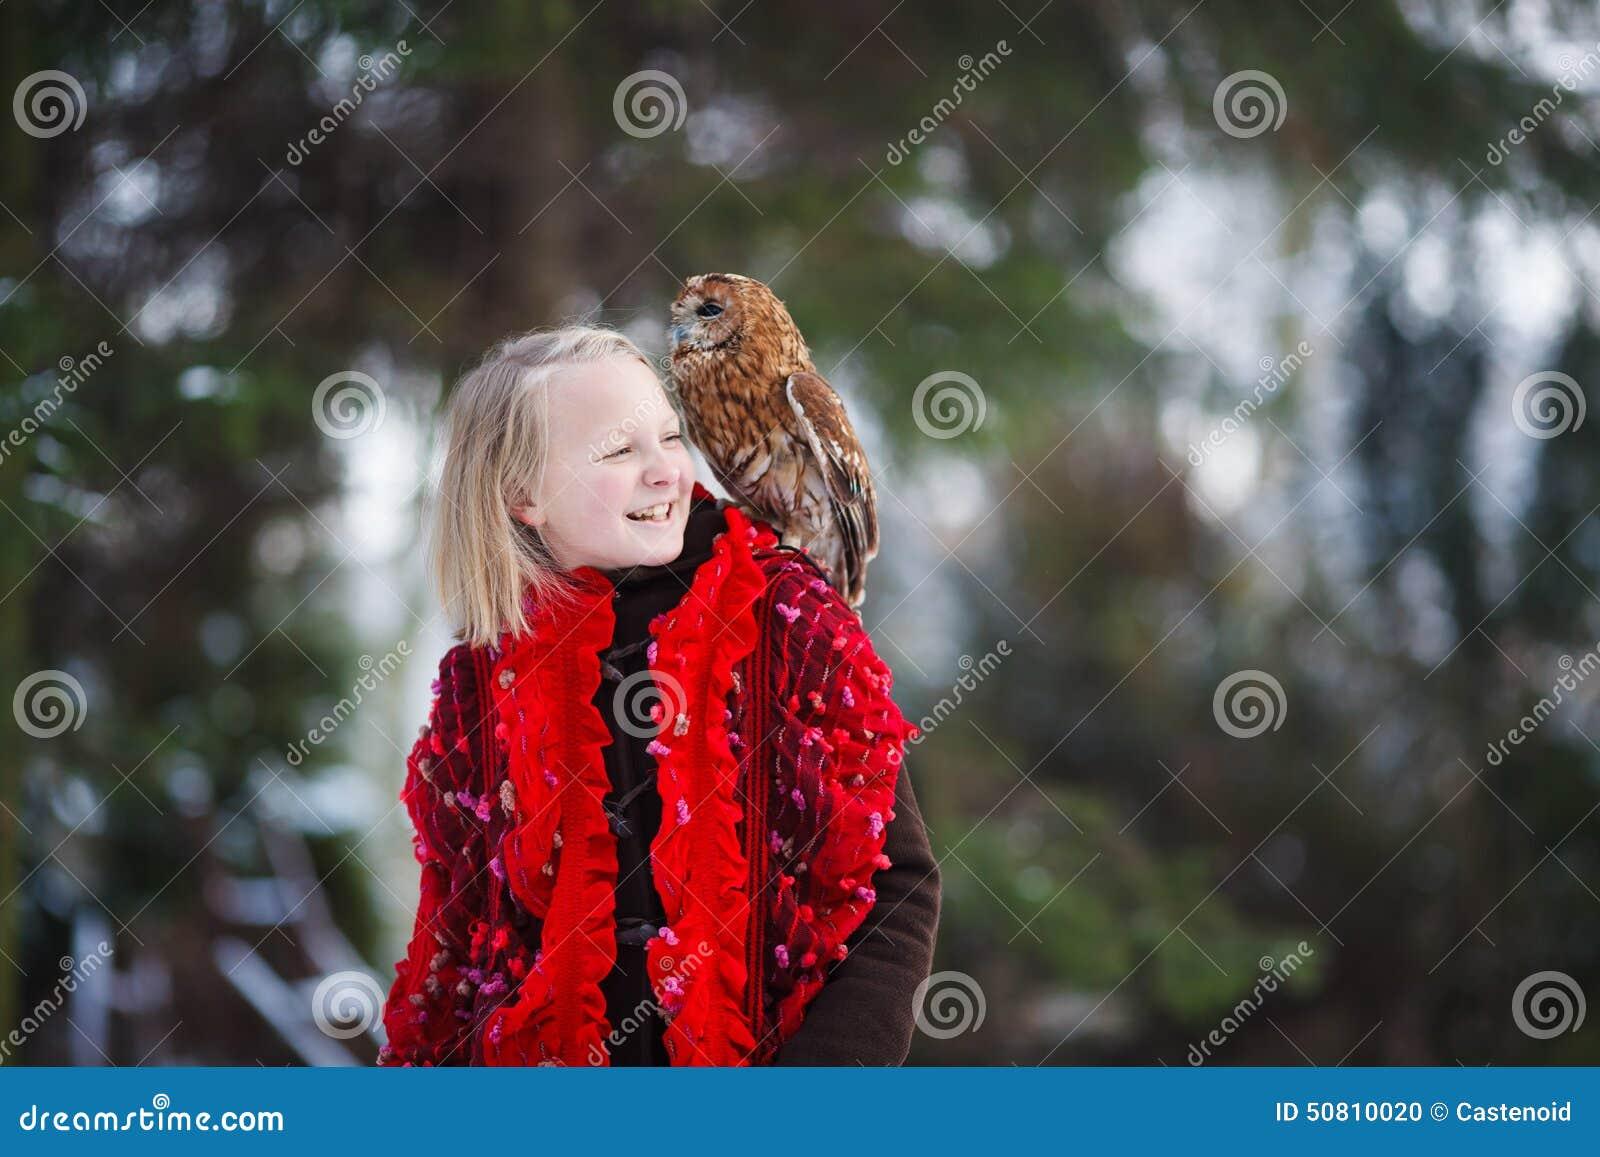 red owl girls Nova skin gallery - minecraft skins from novaskin editor toggle navigation links  skins  red owl girl 0 owl 141 owl girl 3 dbz owl 38 owl gaming 2 owl .